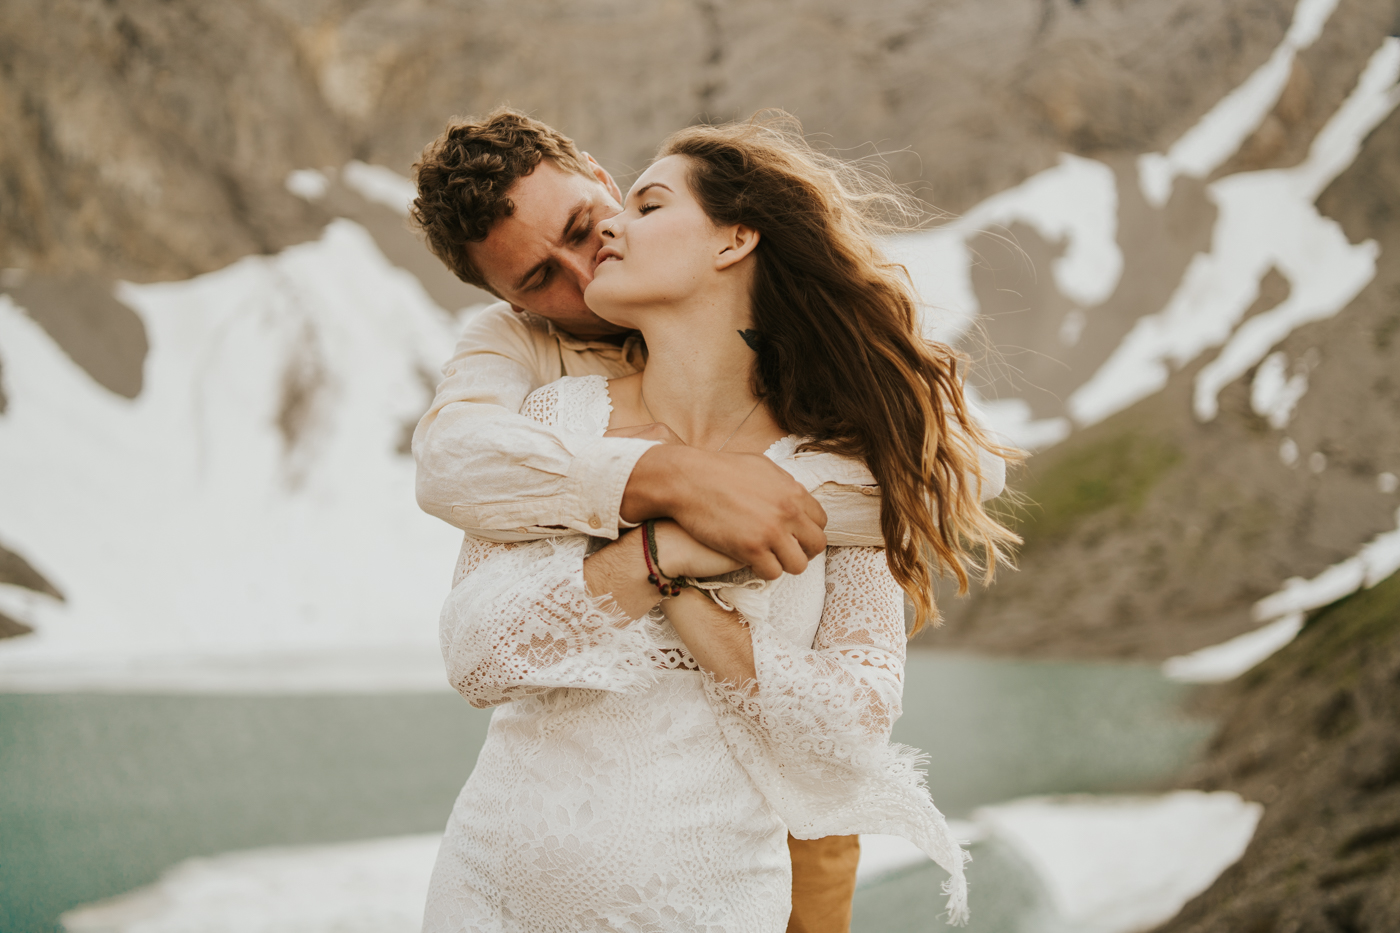 tyraephotography_photographer_wedding_elopement_engagement_photography-07704.jpg